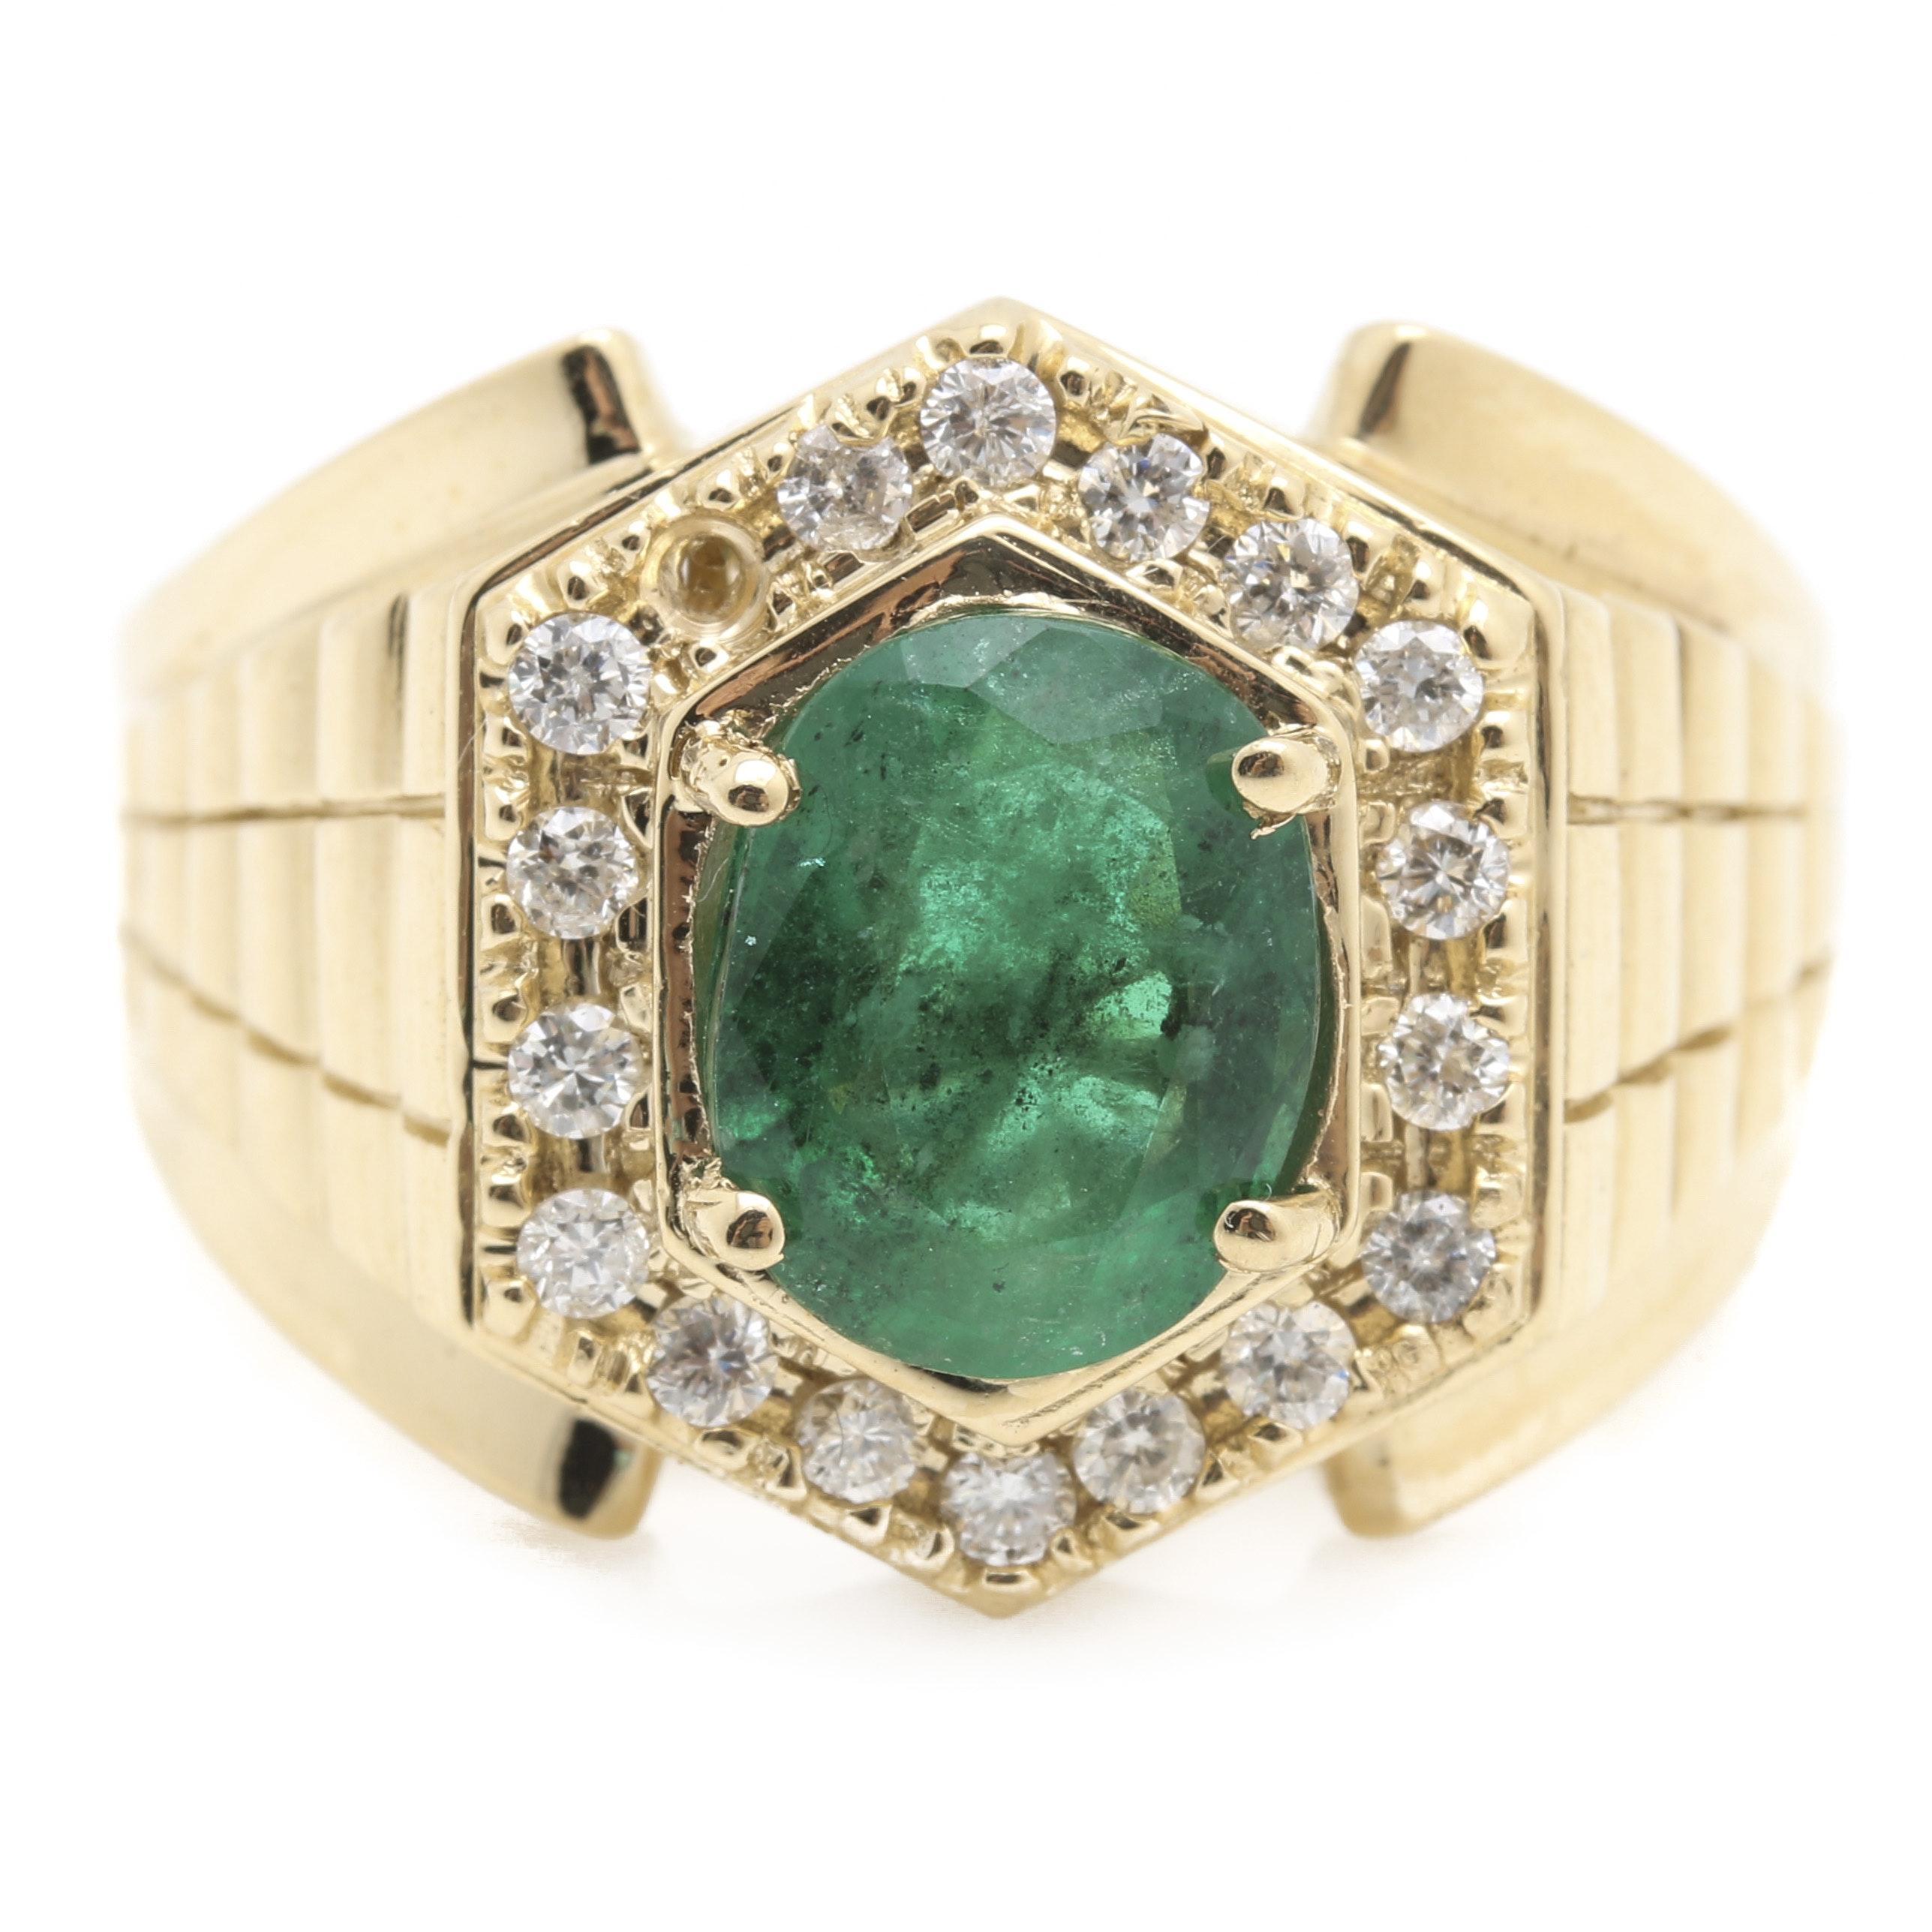 14K Yellow Gold 2.30 CT Emerald and Diamond Ring